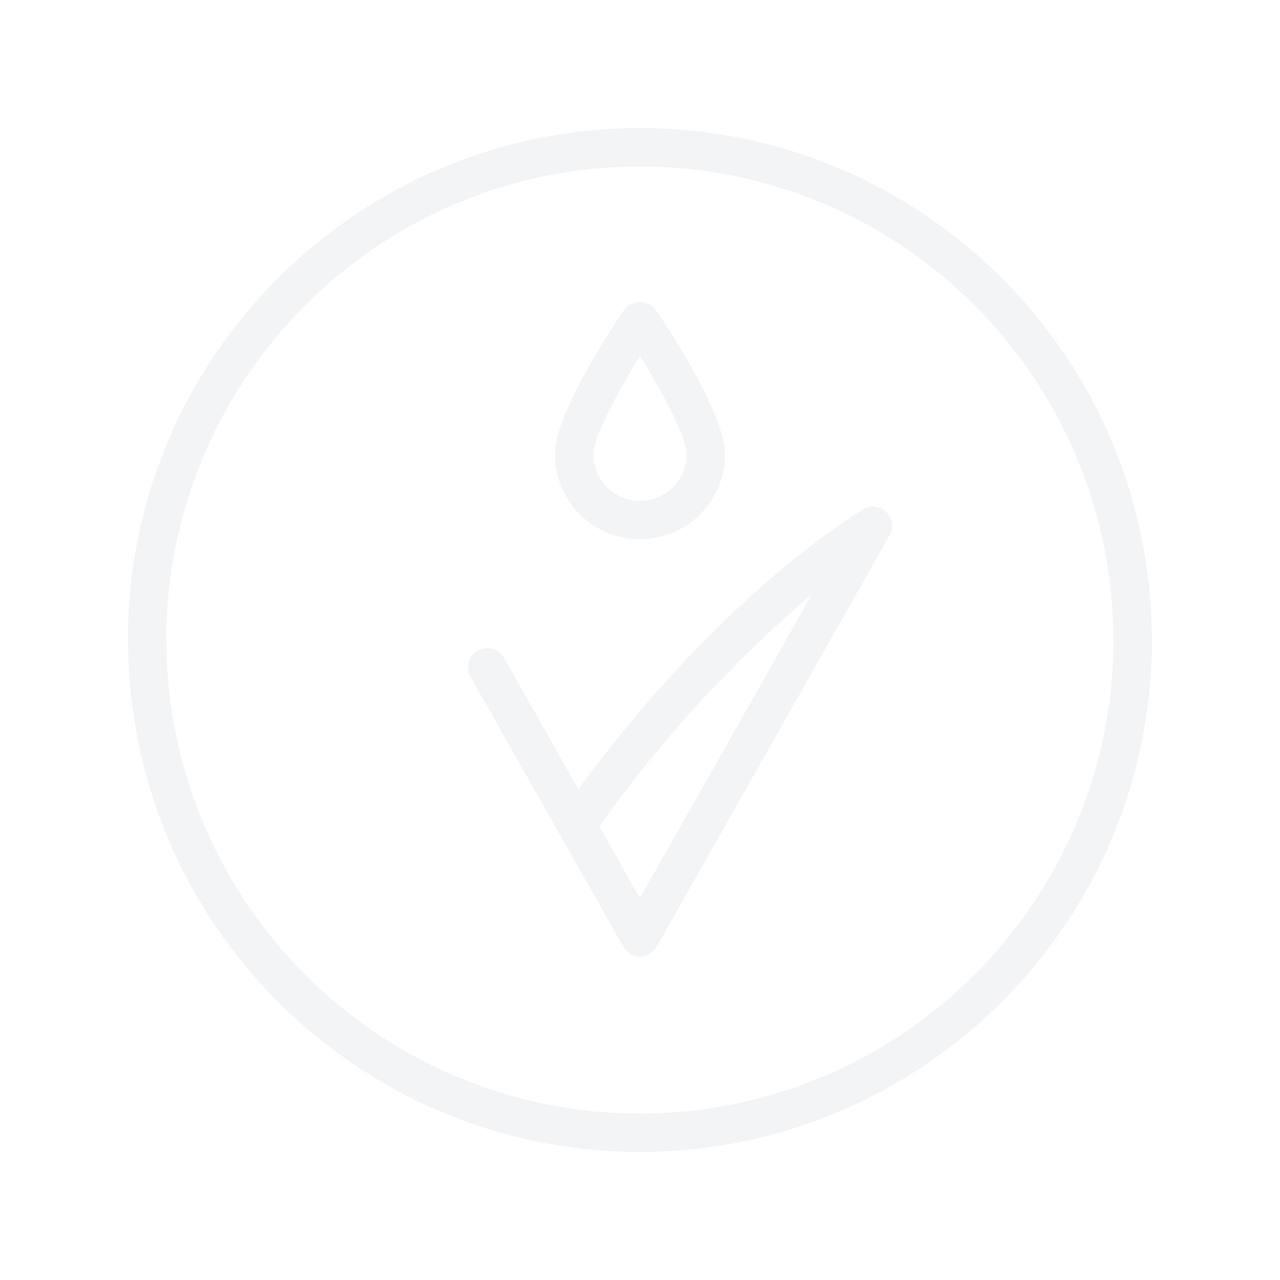 BIOTHERM Purefect Skin Cleansing Gel 125ml